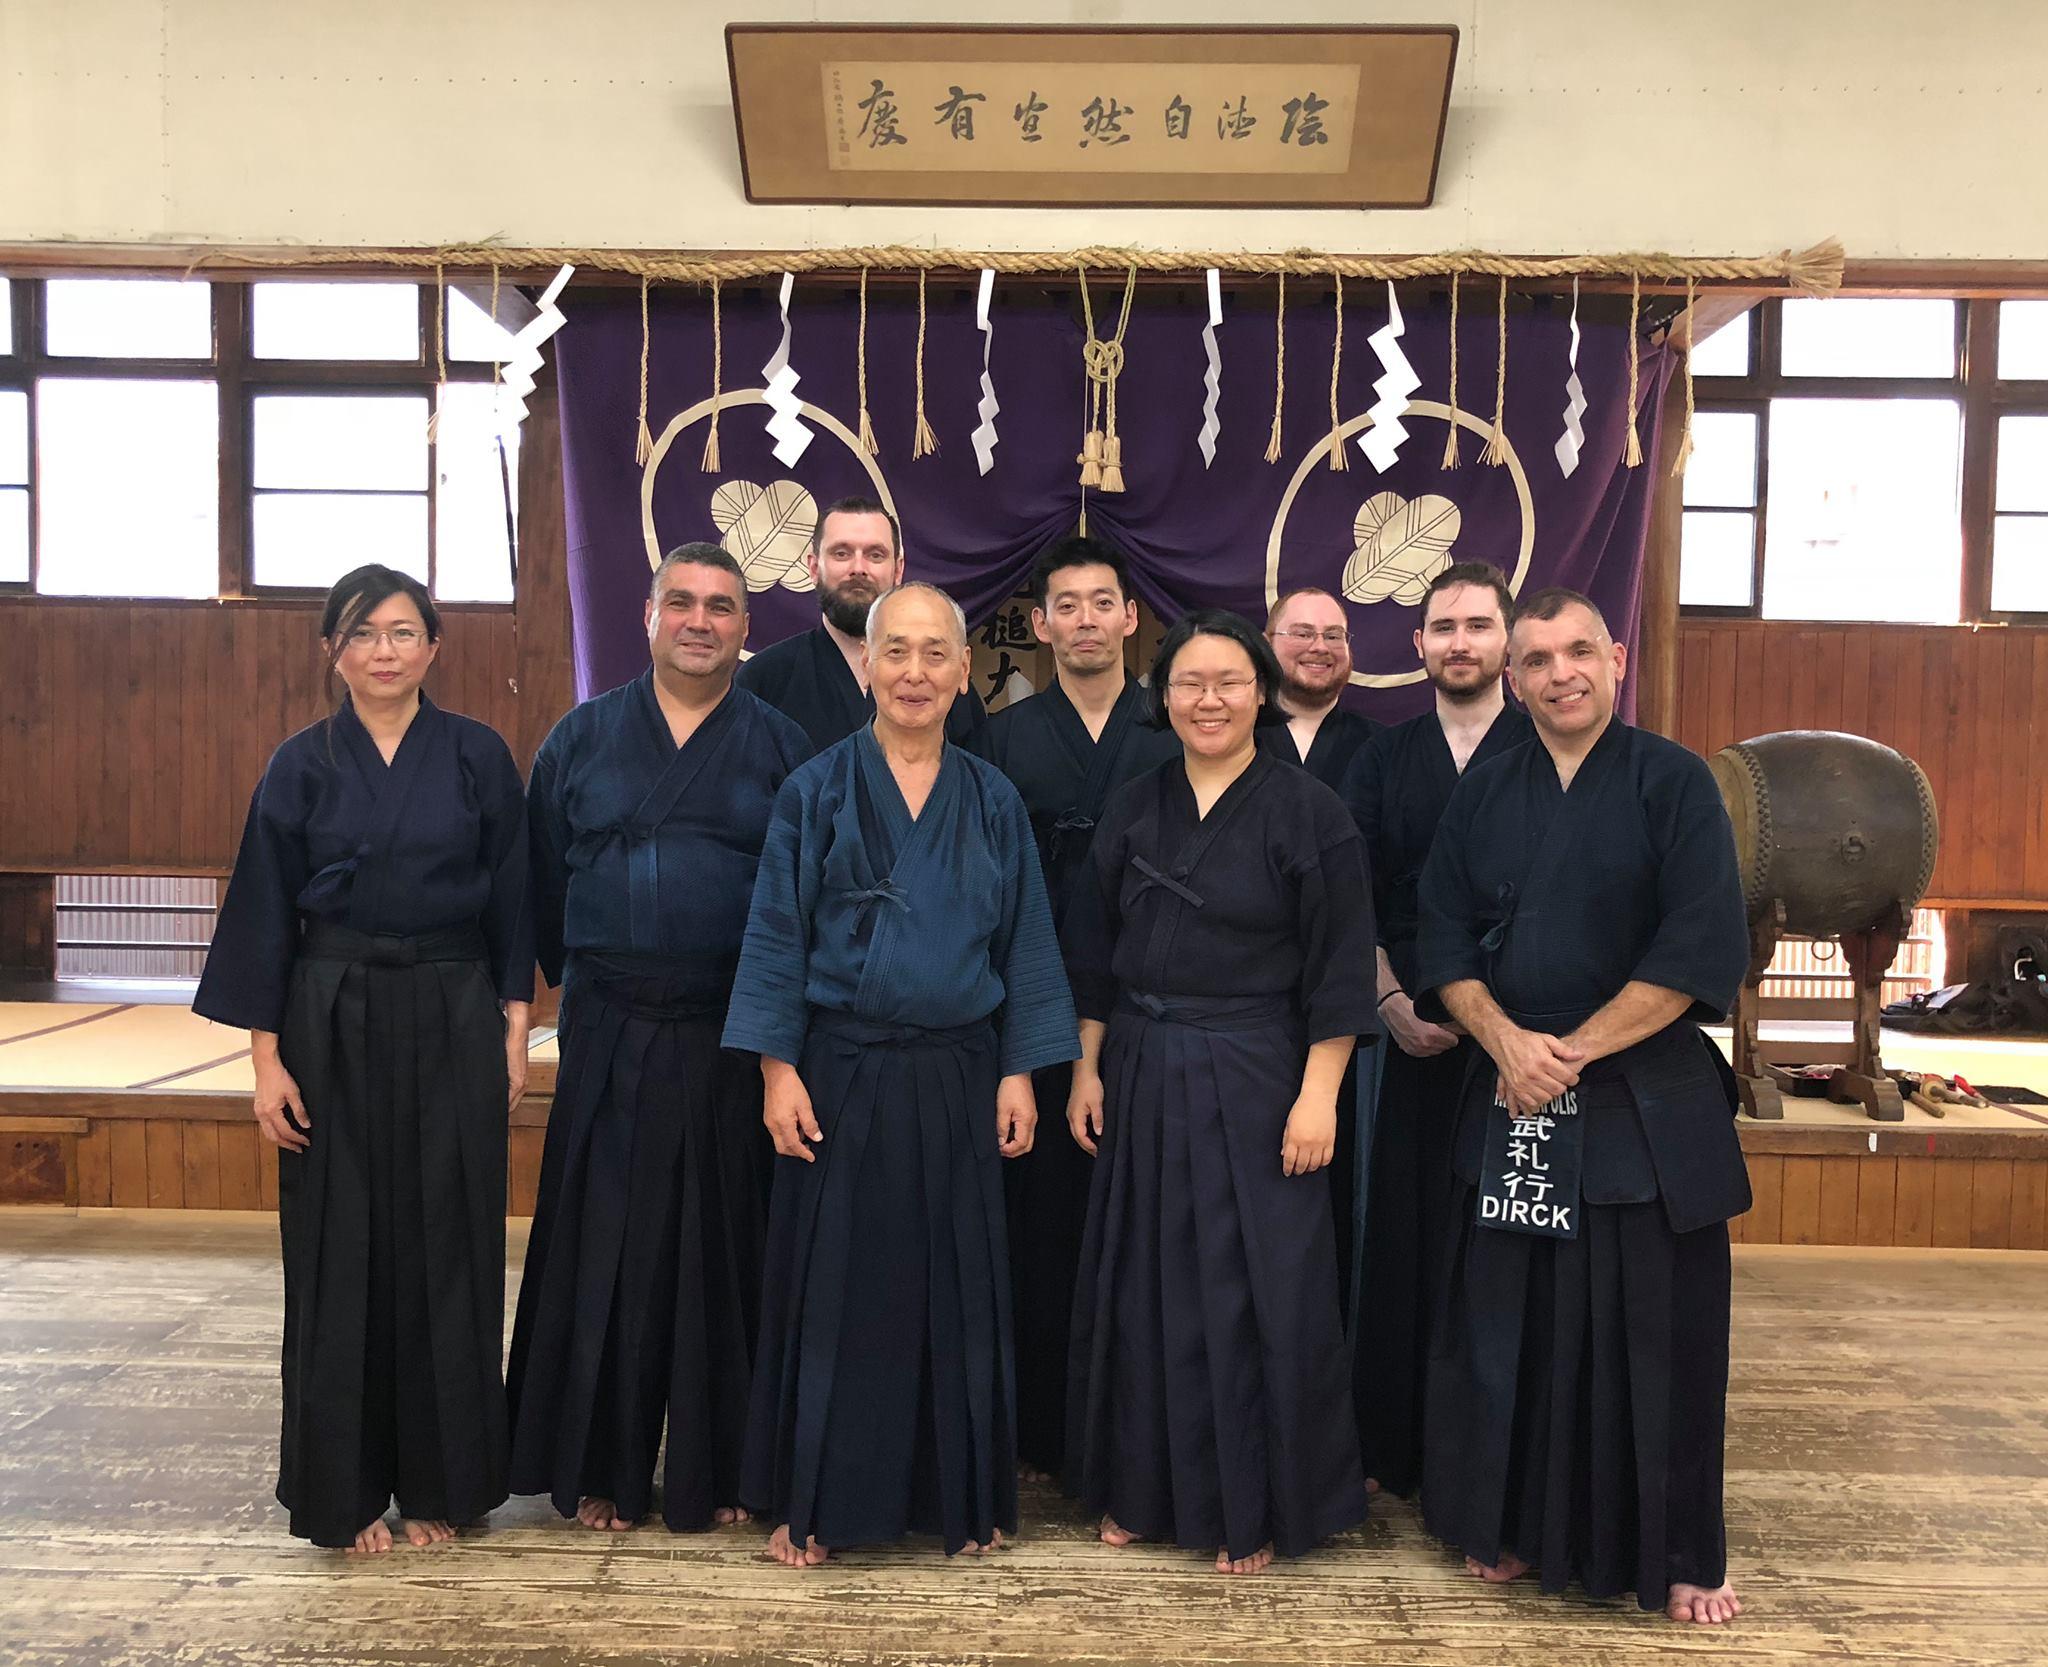 Kendo Japan Tour 2018 Group Photo at Shubukan